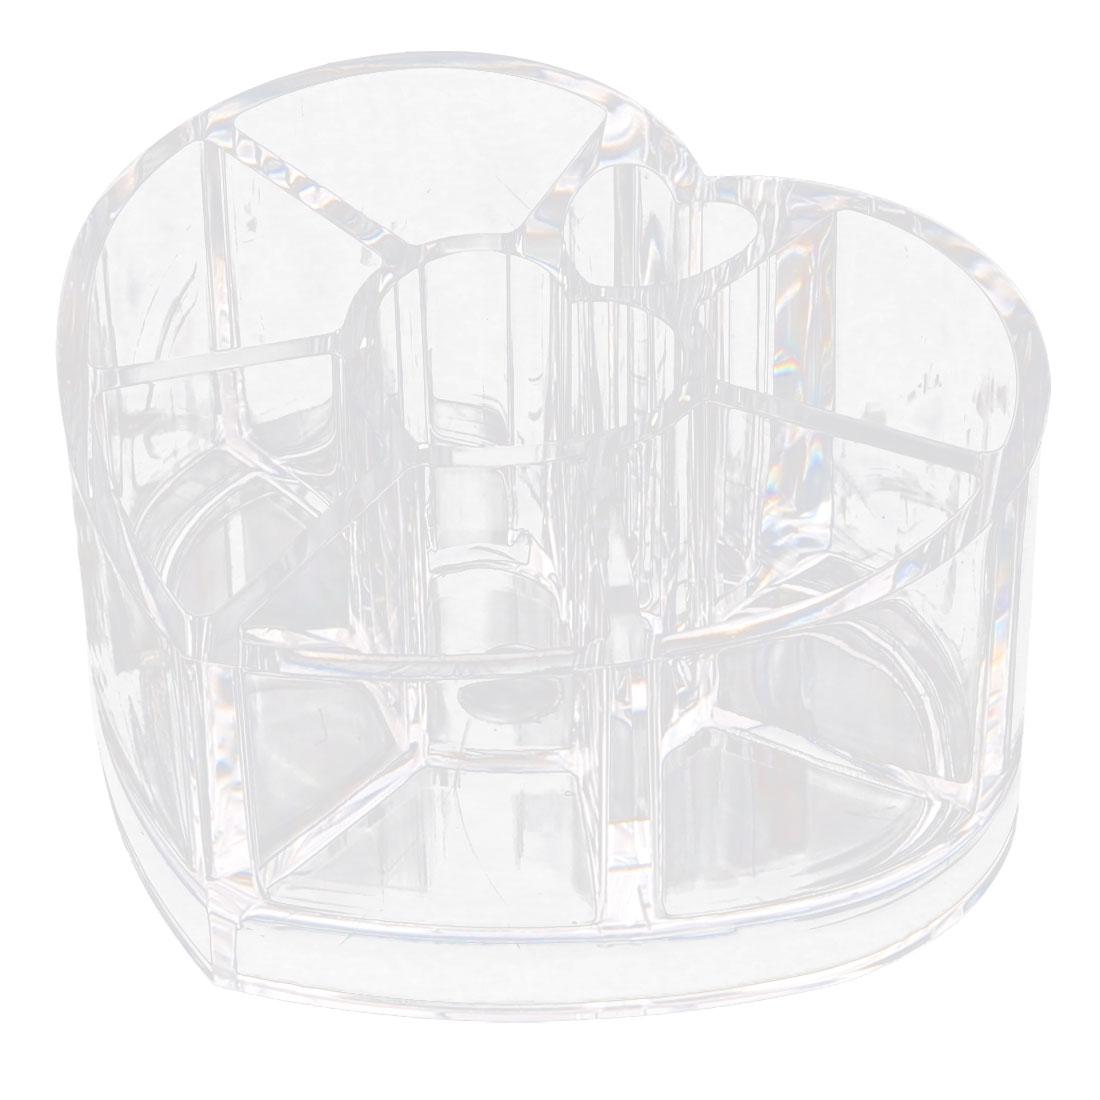 Acrylic 8 Slots Heart Shape Lipstick Holder Jewelry Box Organizer Clear